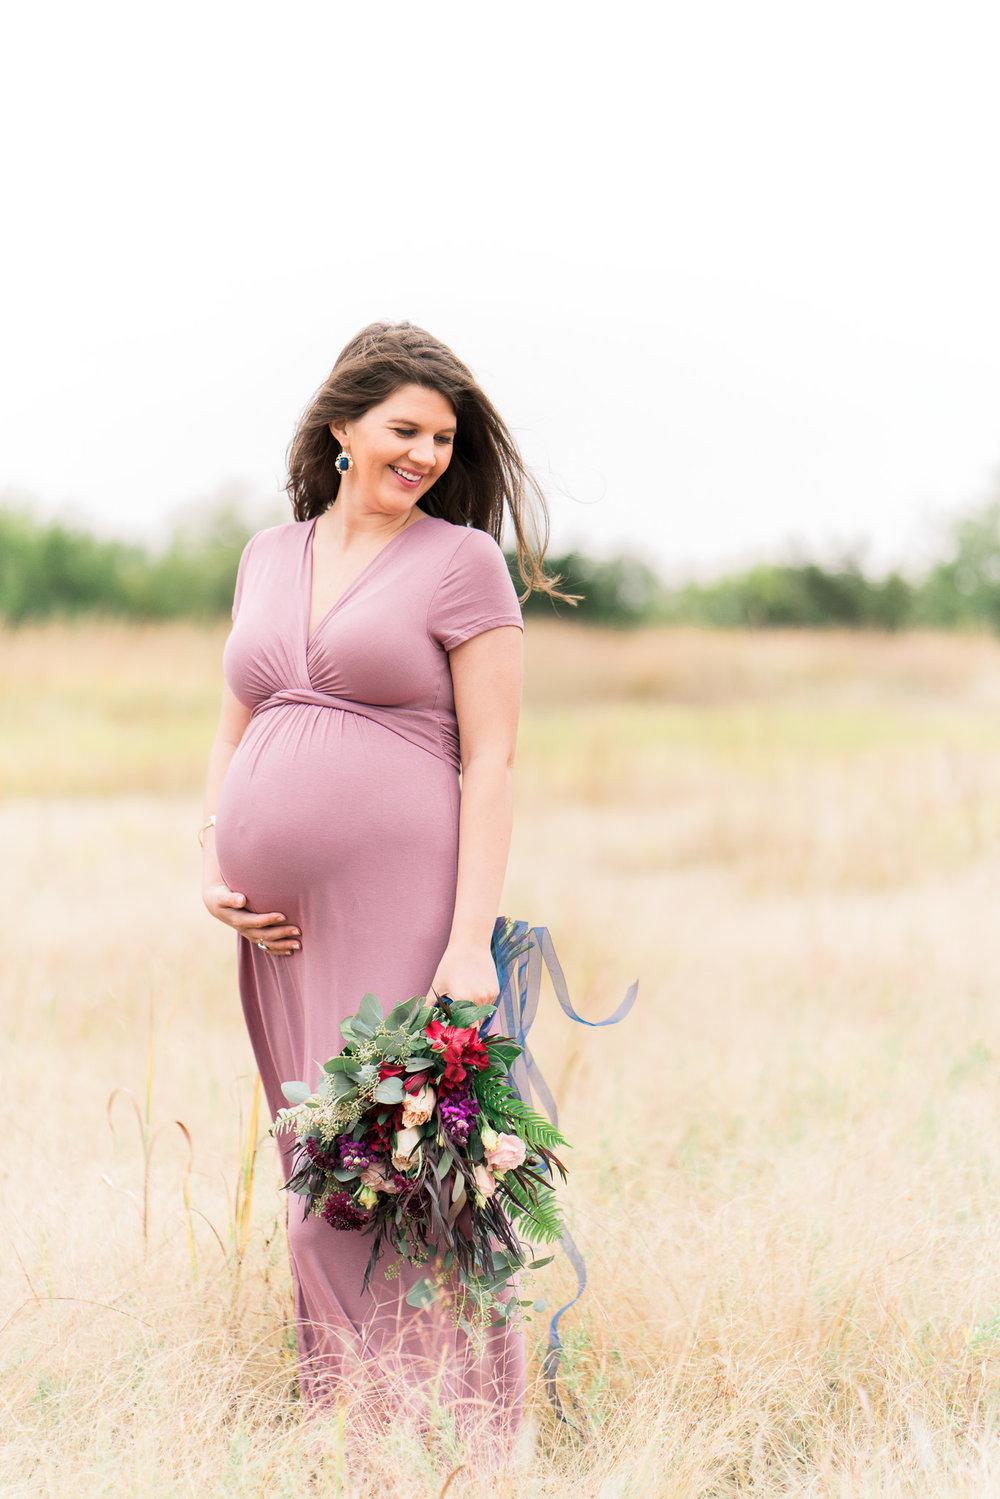 Lizanne-Andrew-Maternity-Kate-Bernard-Photography-Web-13.jpg